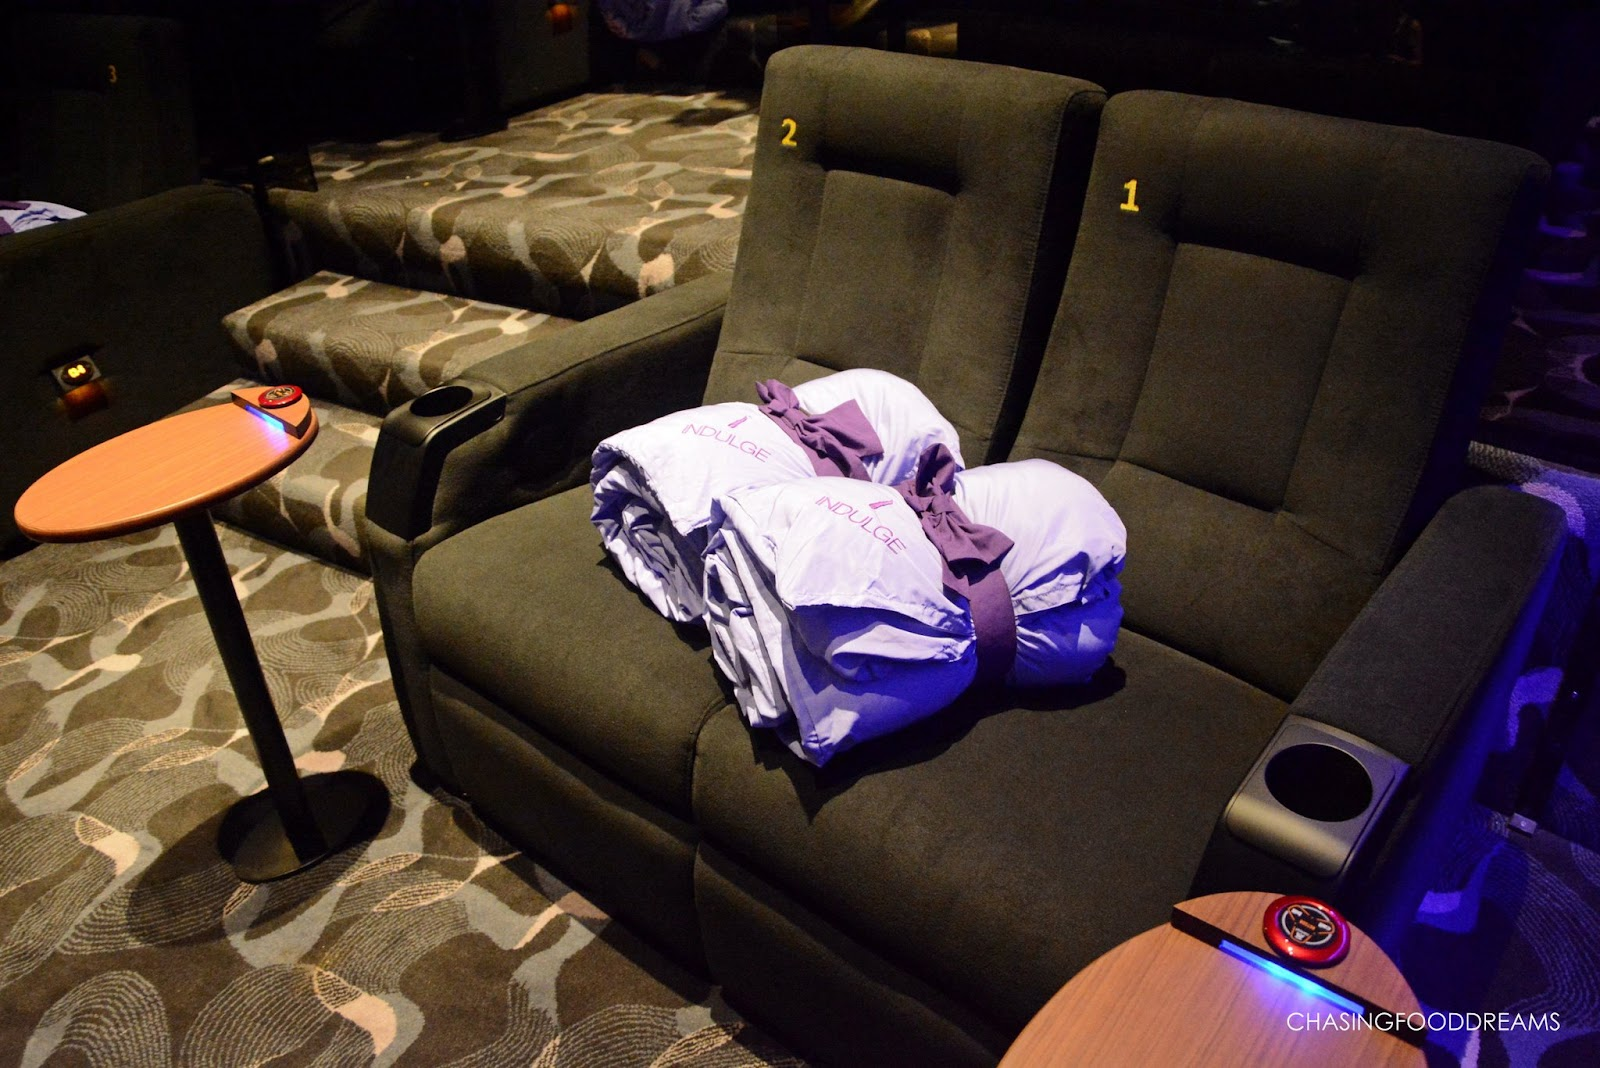 Chasing Food Dreams Indulge Tgv Cinemas 1 Utama Time To